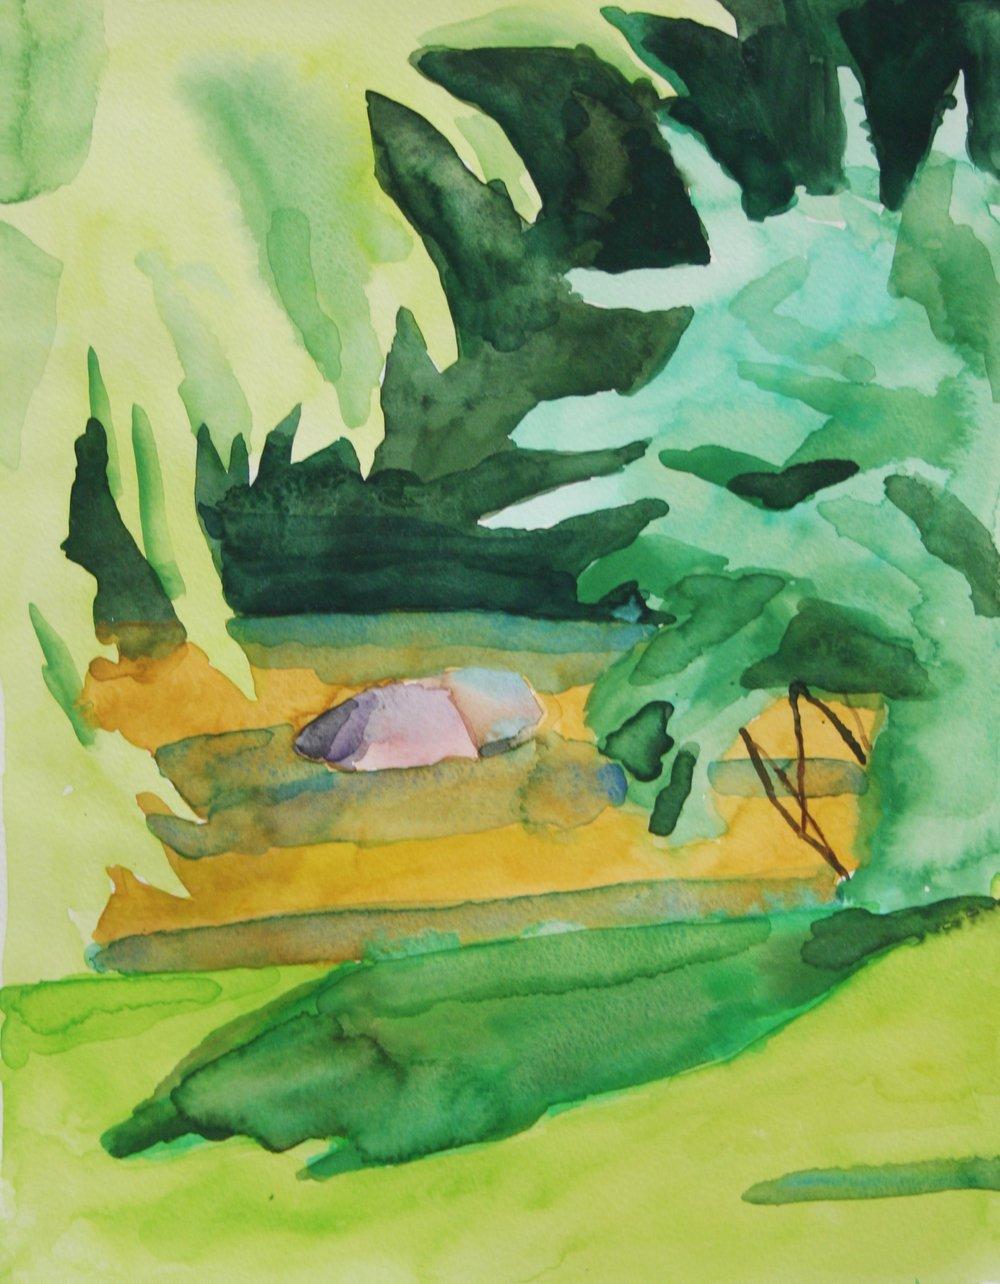 River spot, Watercolor, 10.5 x 8 in, 2016